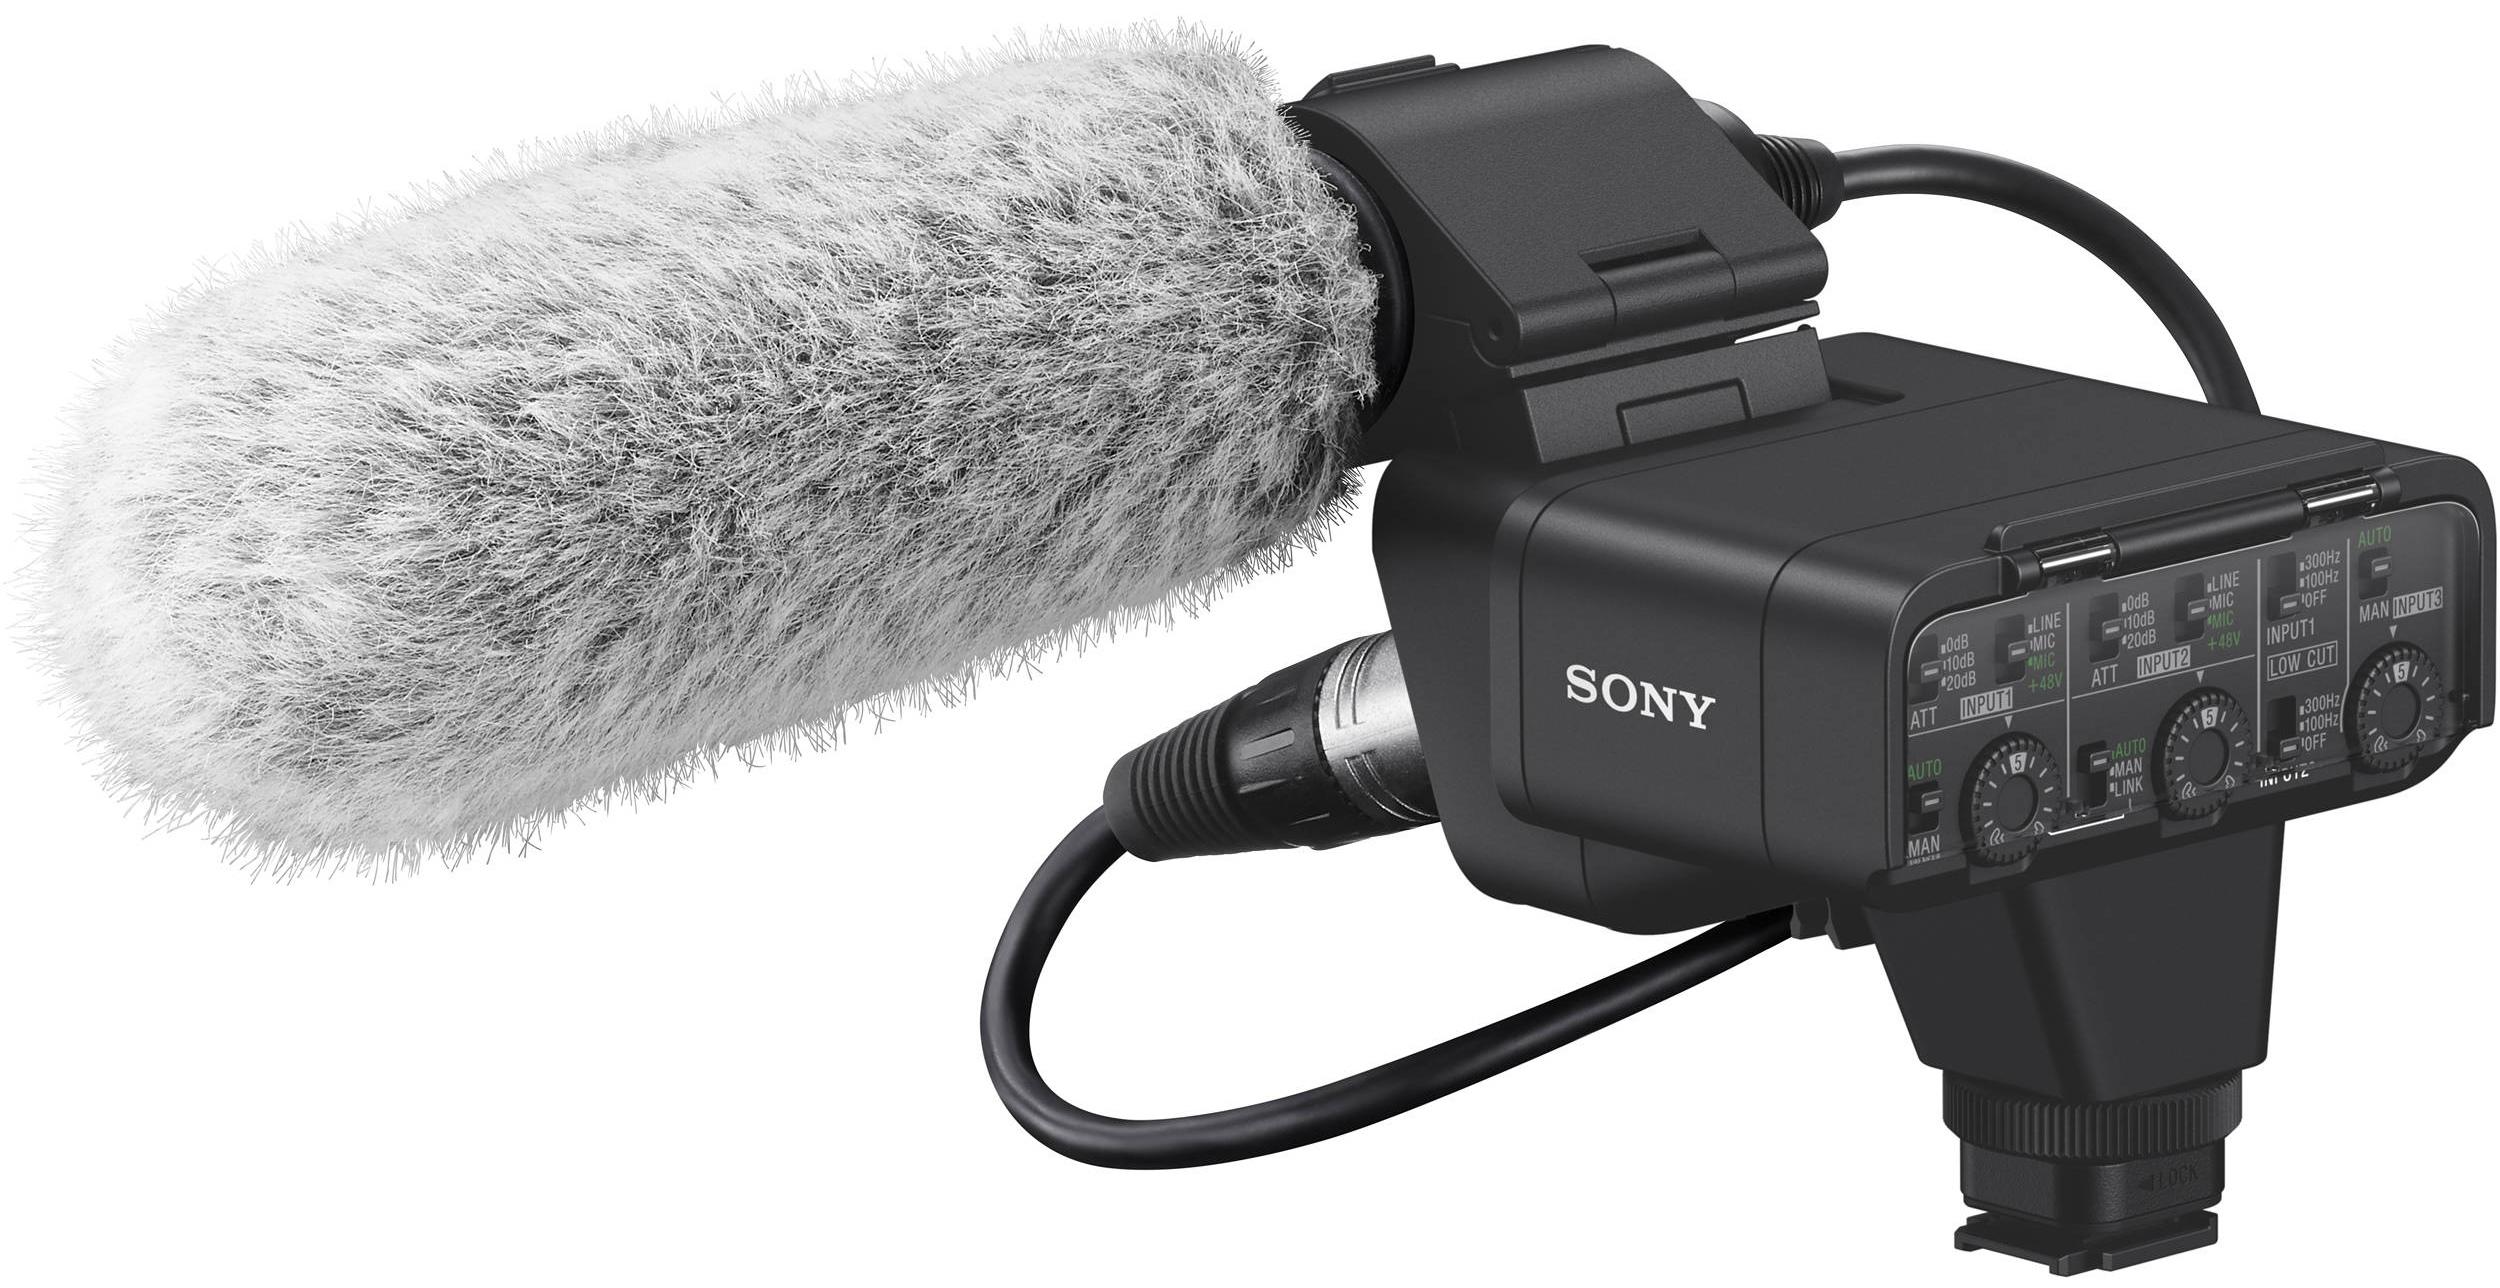 SONY XLR-K3M XLR mikrofon adapter kit